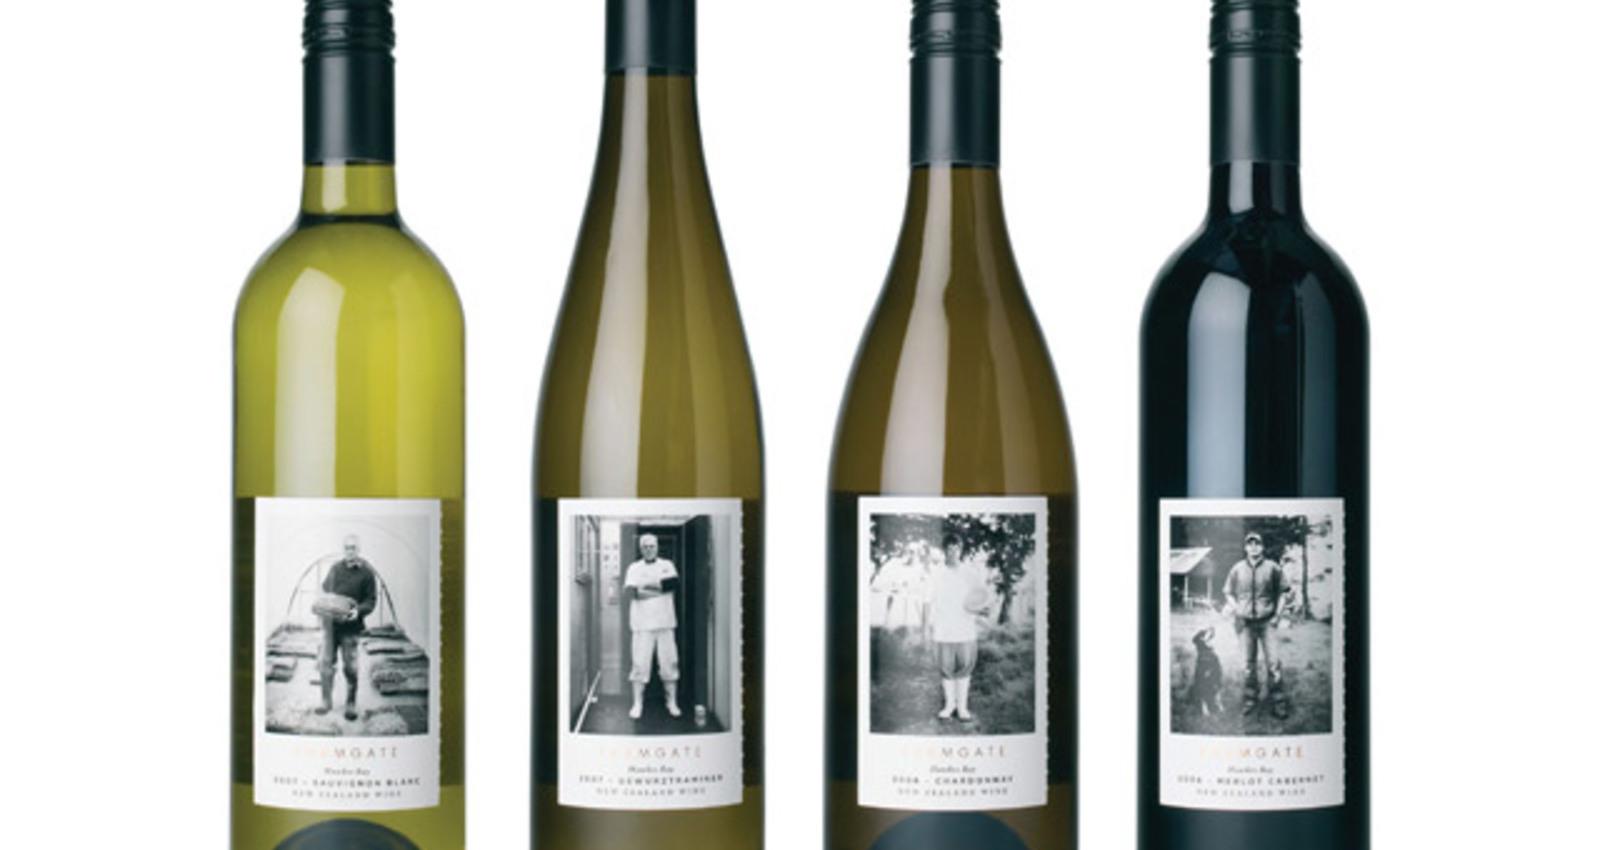 Farmgate Wines